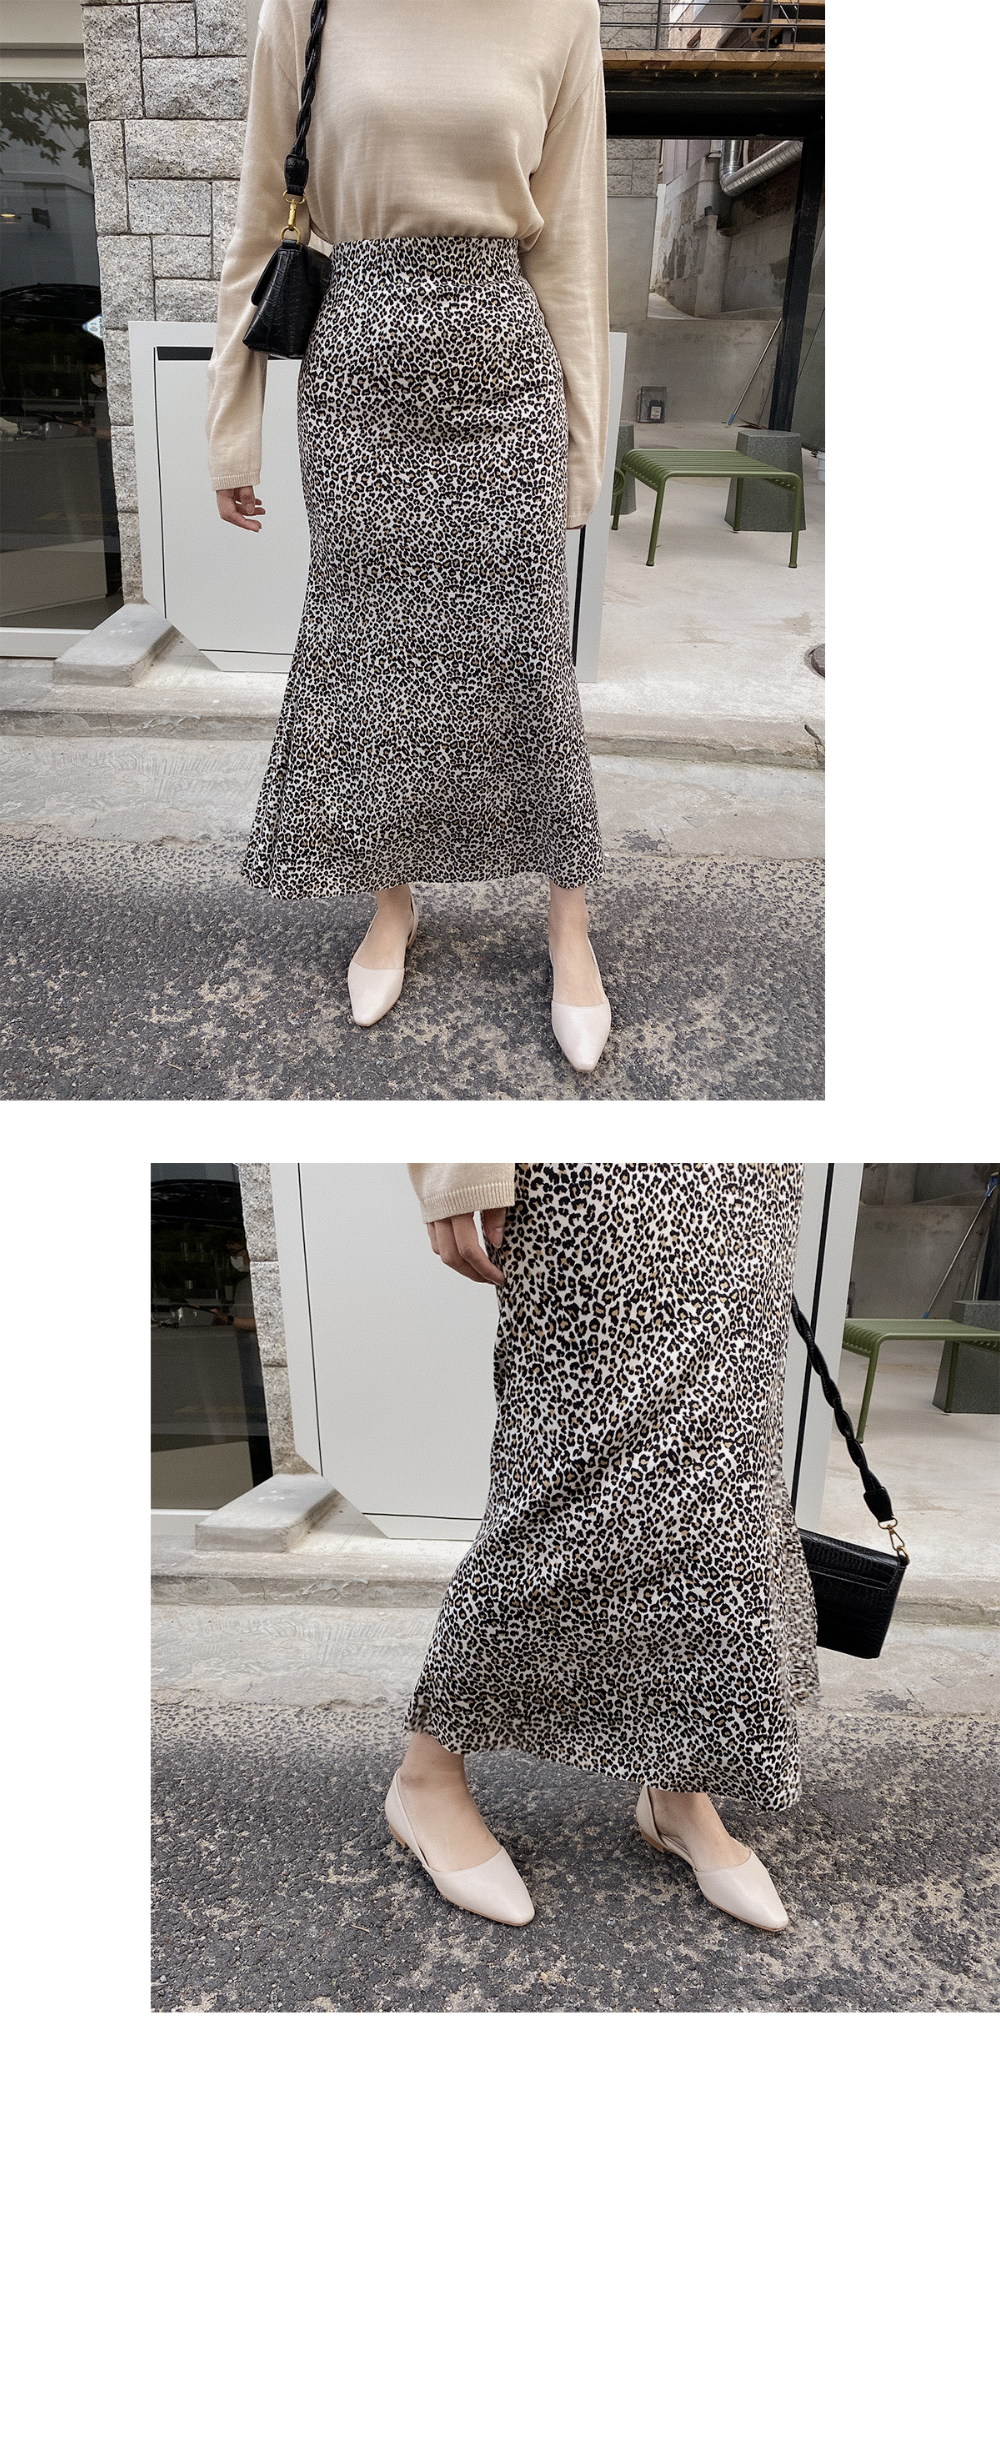 Mermaid Fit Leopard Skirt-2color